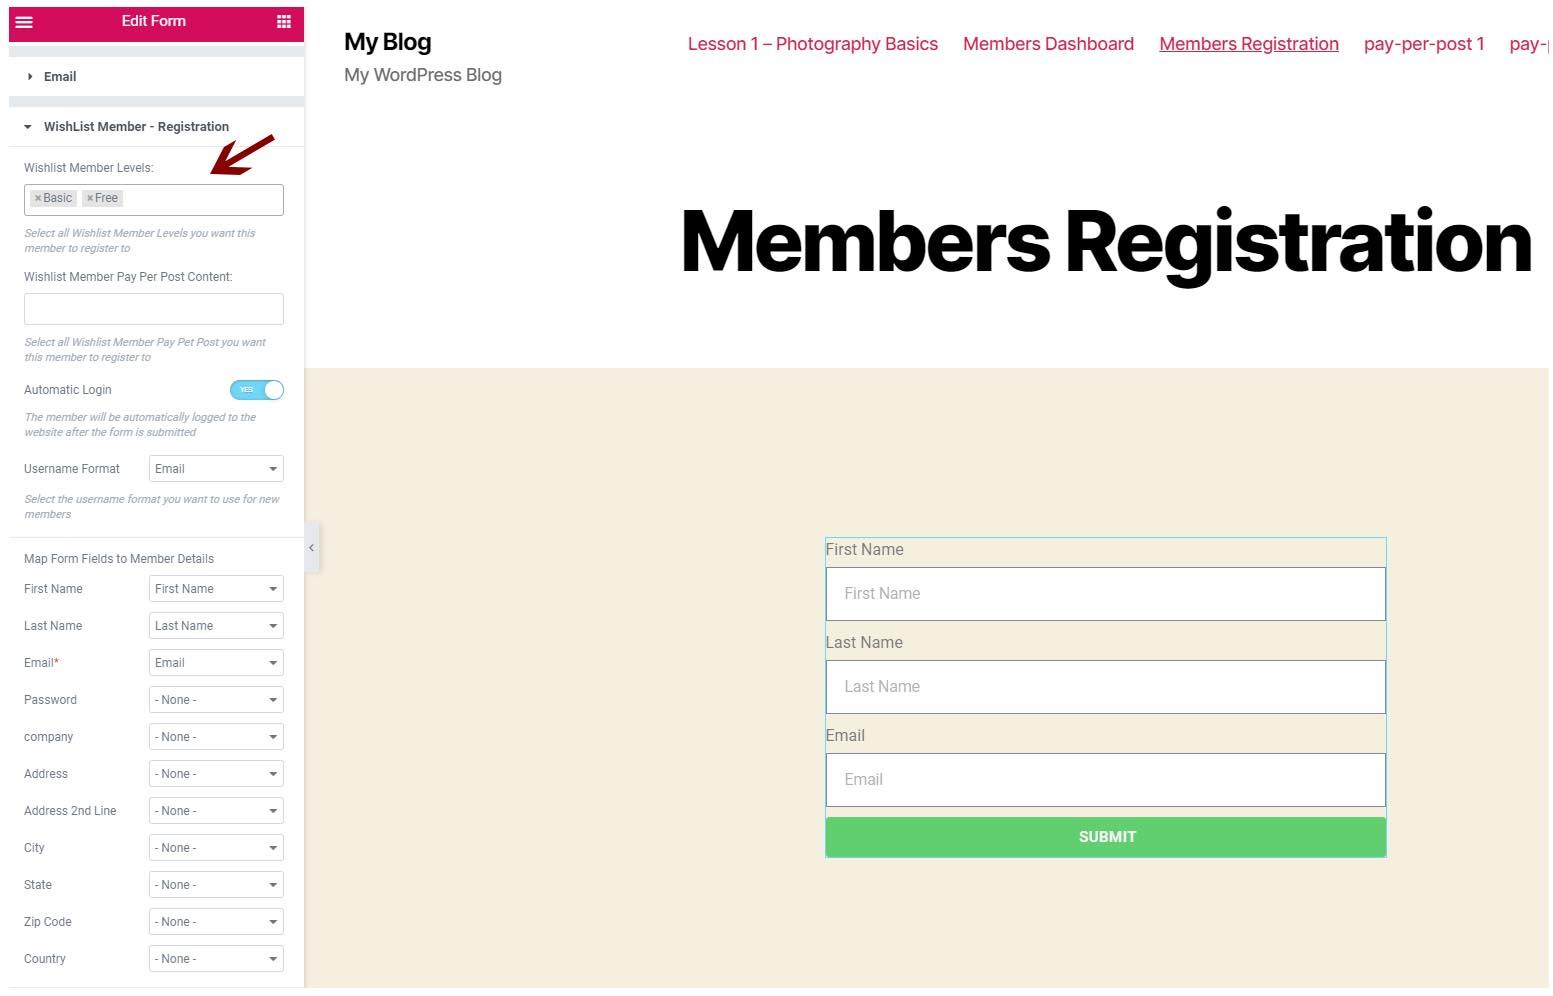 Define WishList Member membership levels (Step #4)